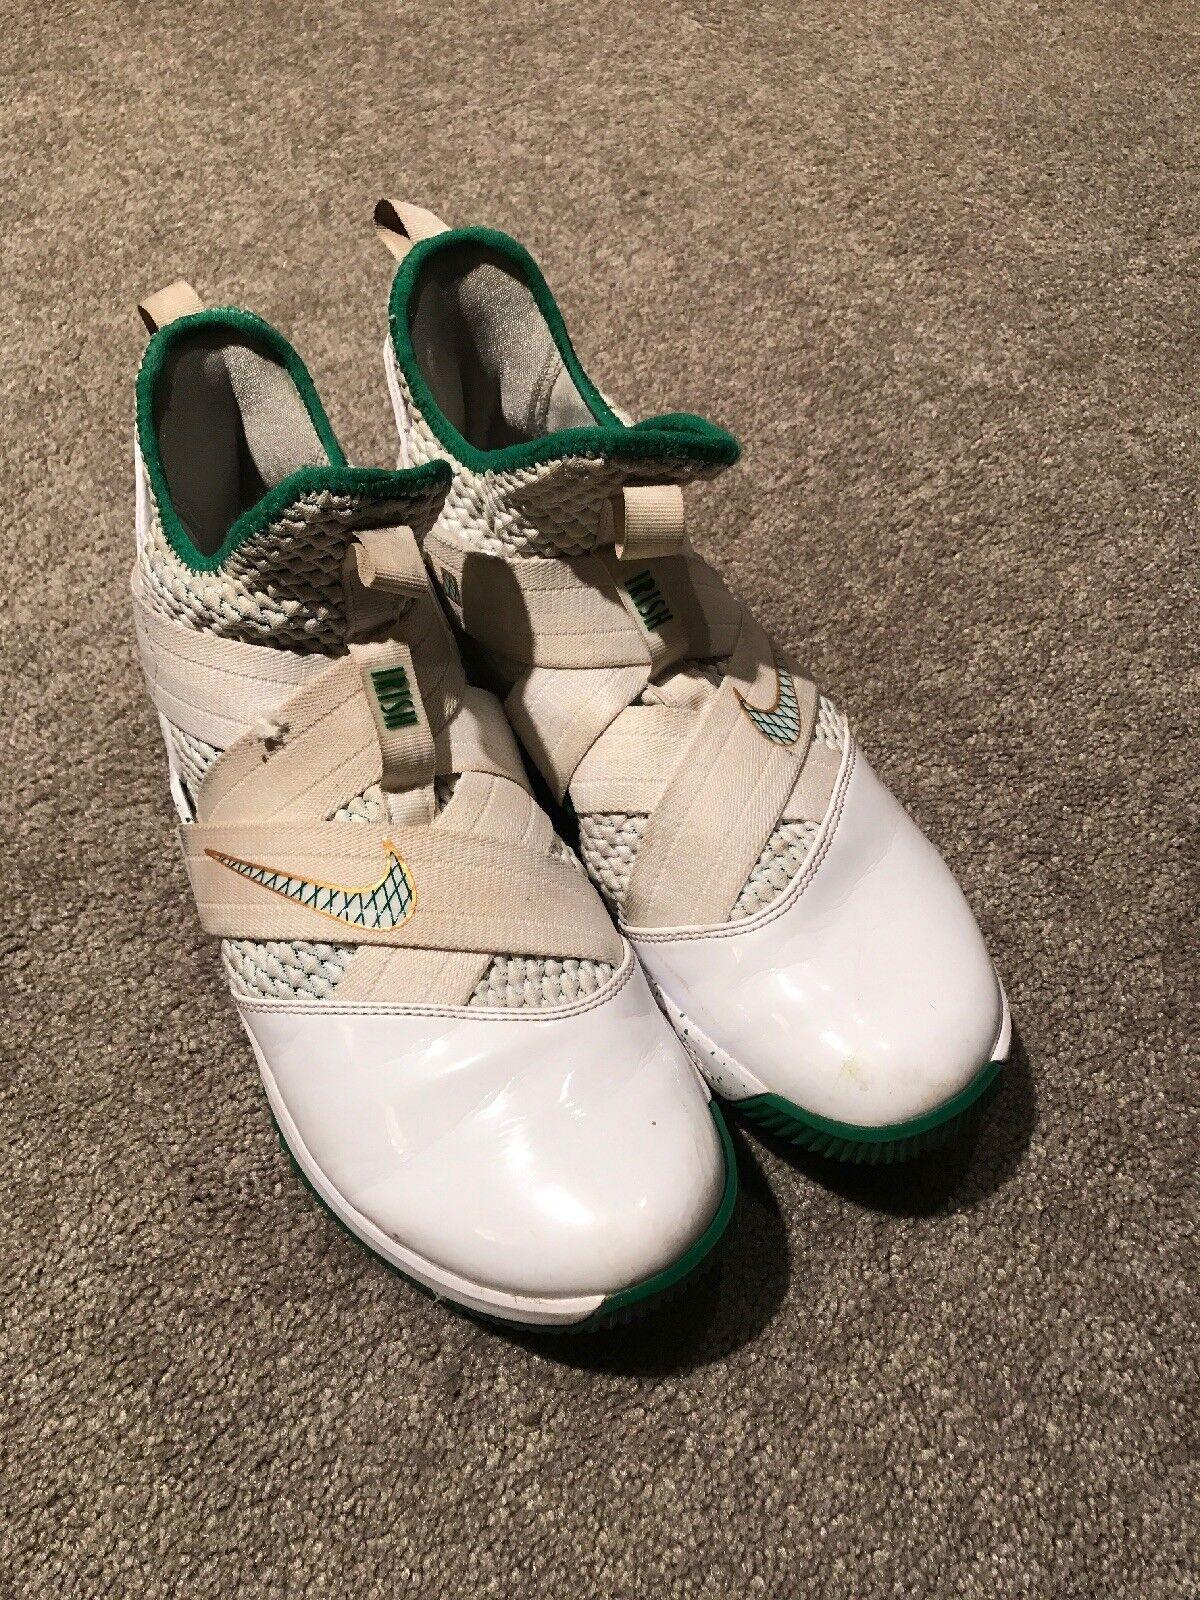 Nike Zoom Lebron Soldier XII - Sz 9.5- SVSM PE Irish Dunkman Nice